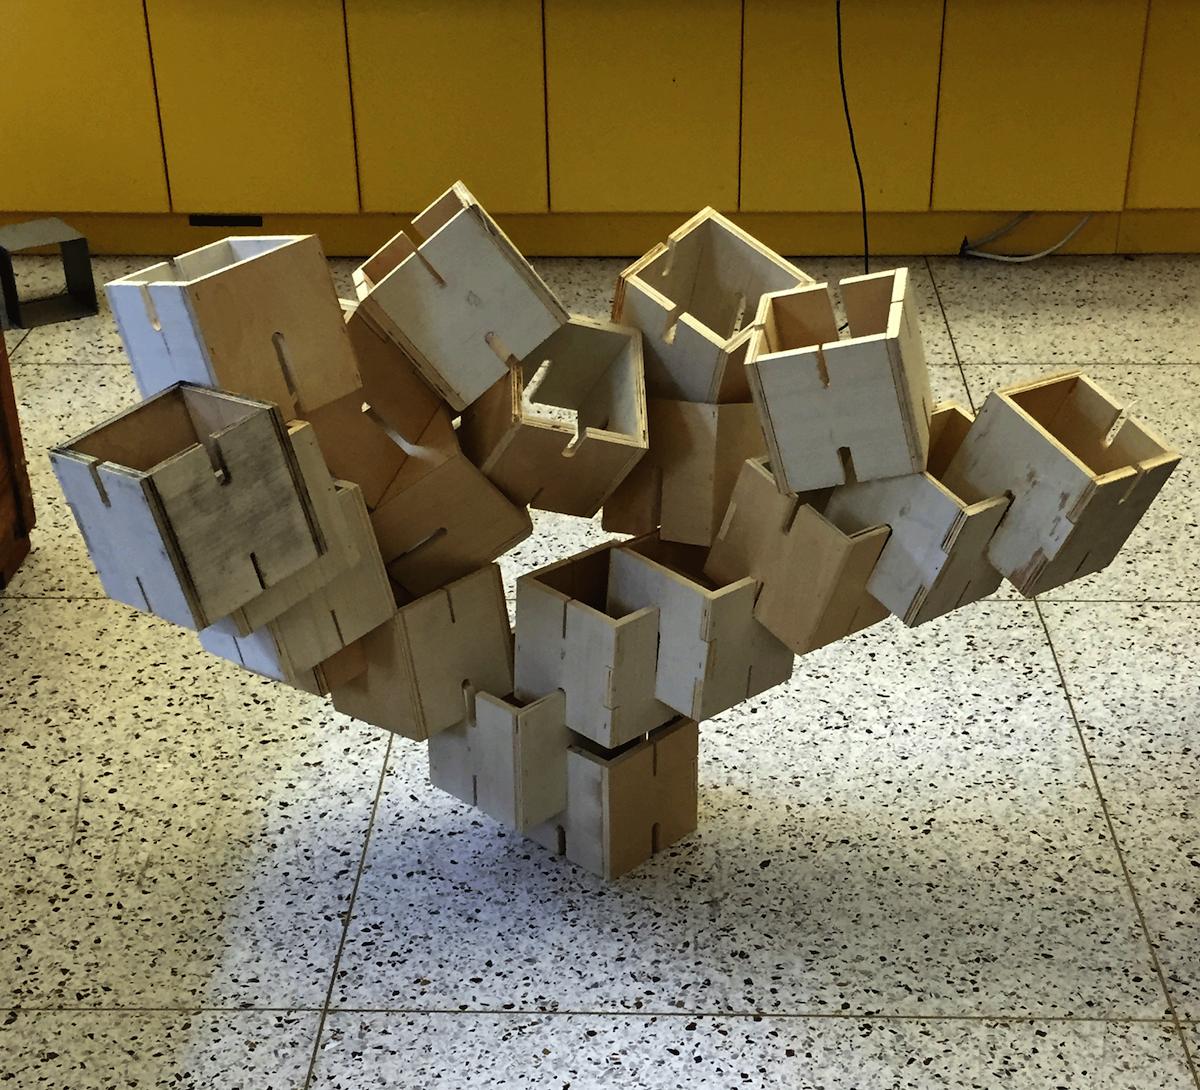 rant_cardboard_mess_website.png